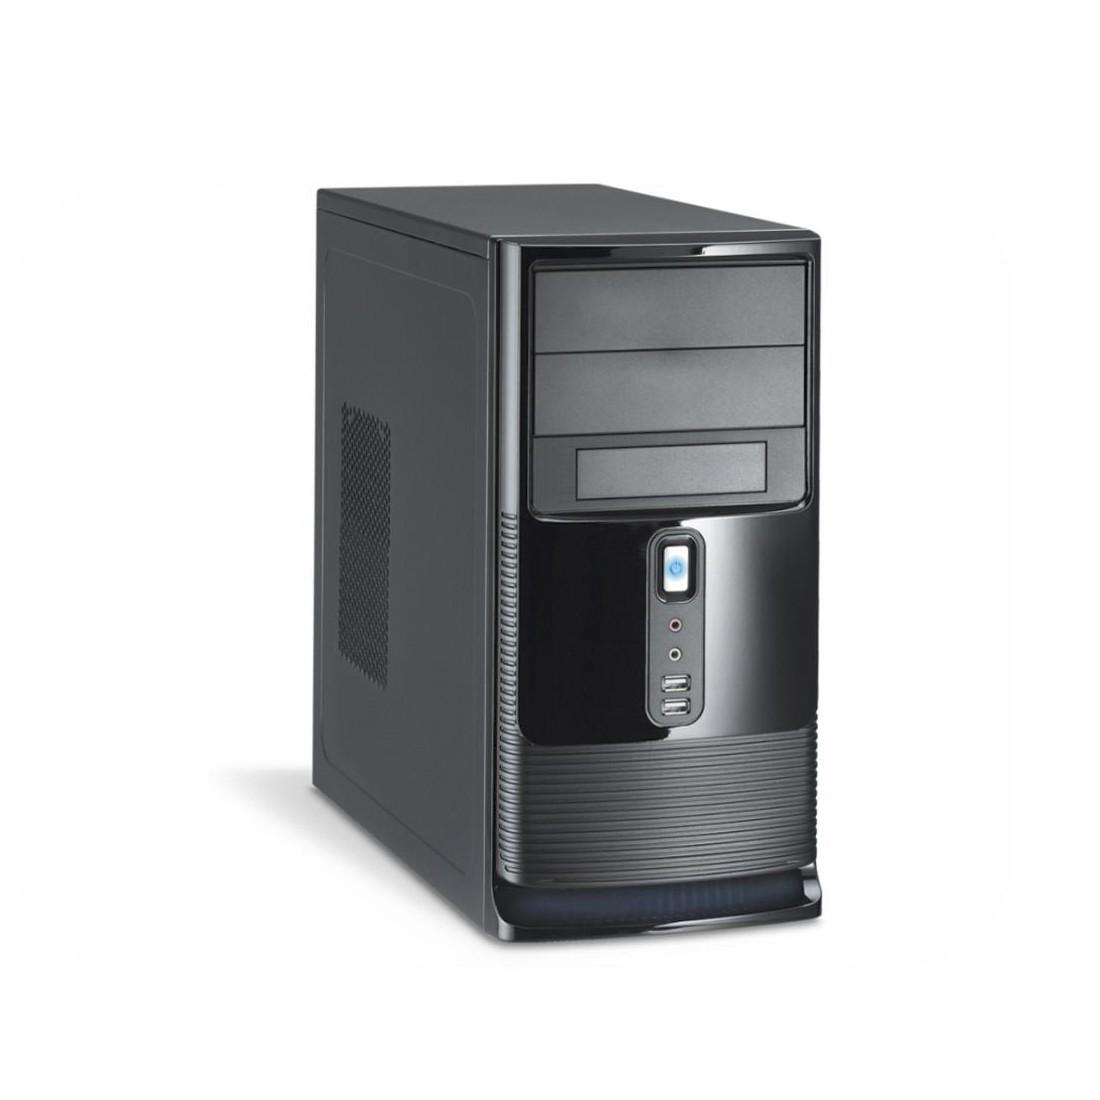 Gabinete Micro ATX Black Piano Kmex CM-9527 Com Fonte 300W 2 Baias